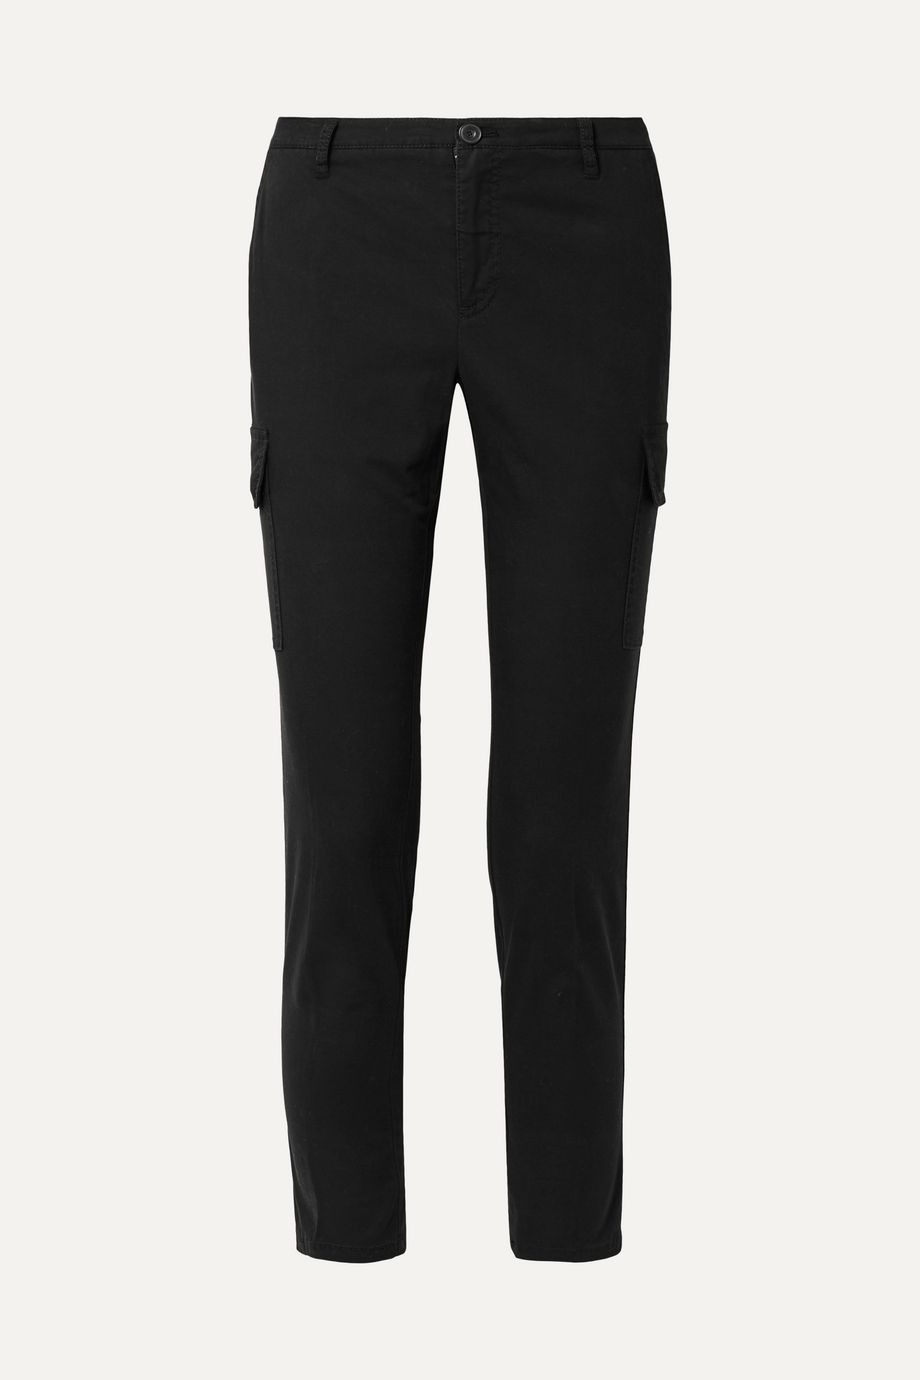 ATM Anthony Thomas Melillo Cotton-blend slim-leg pants